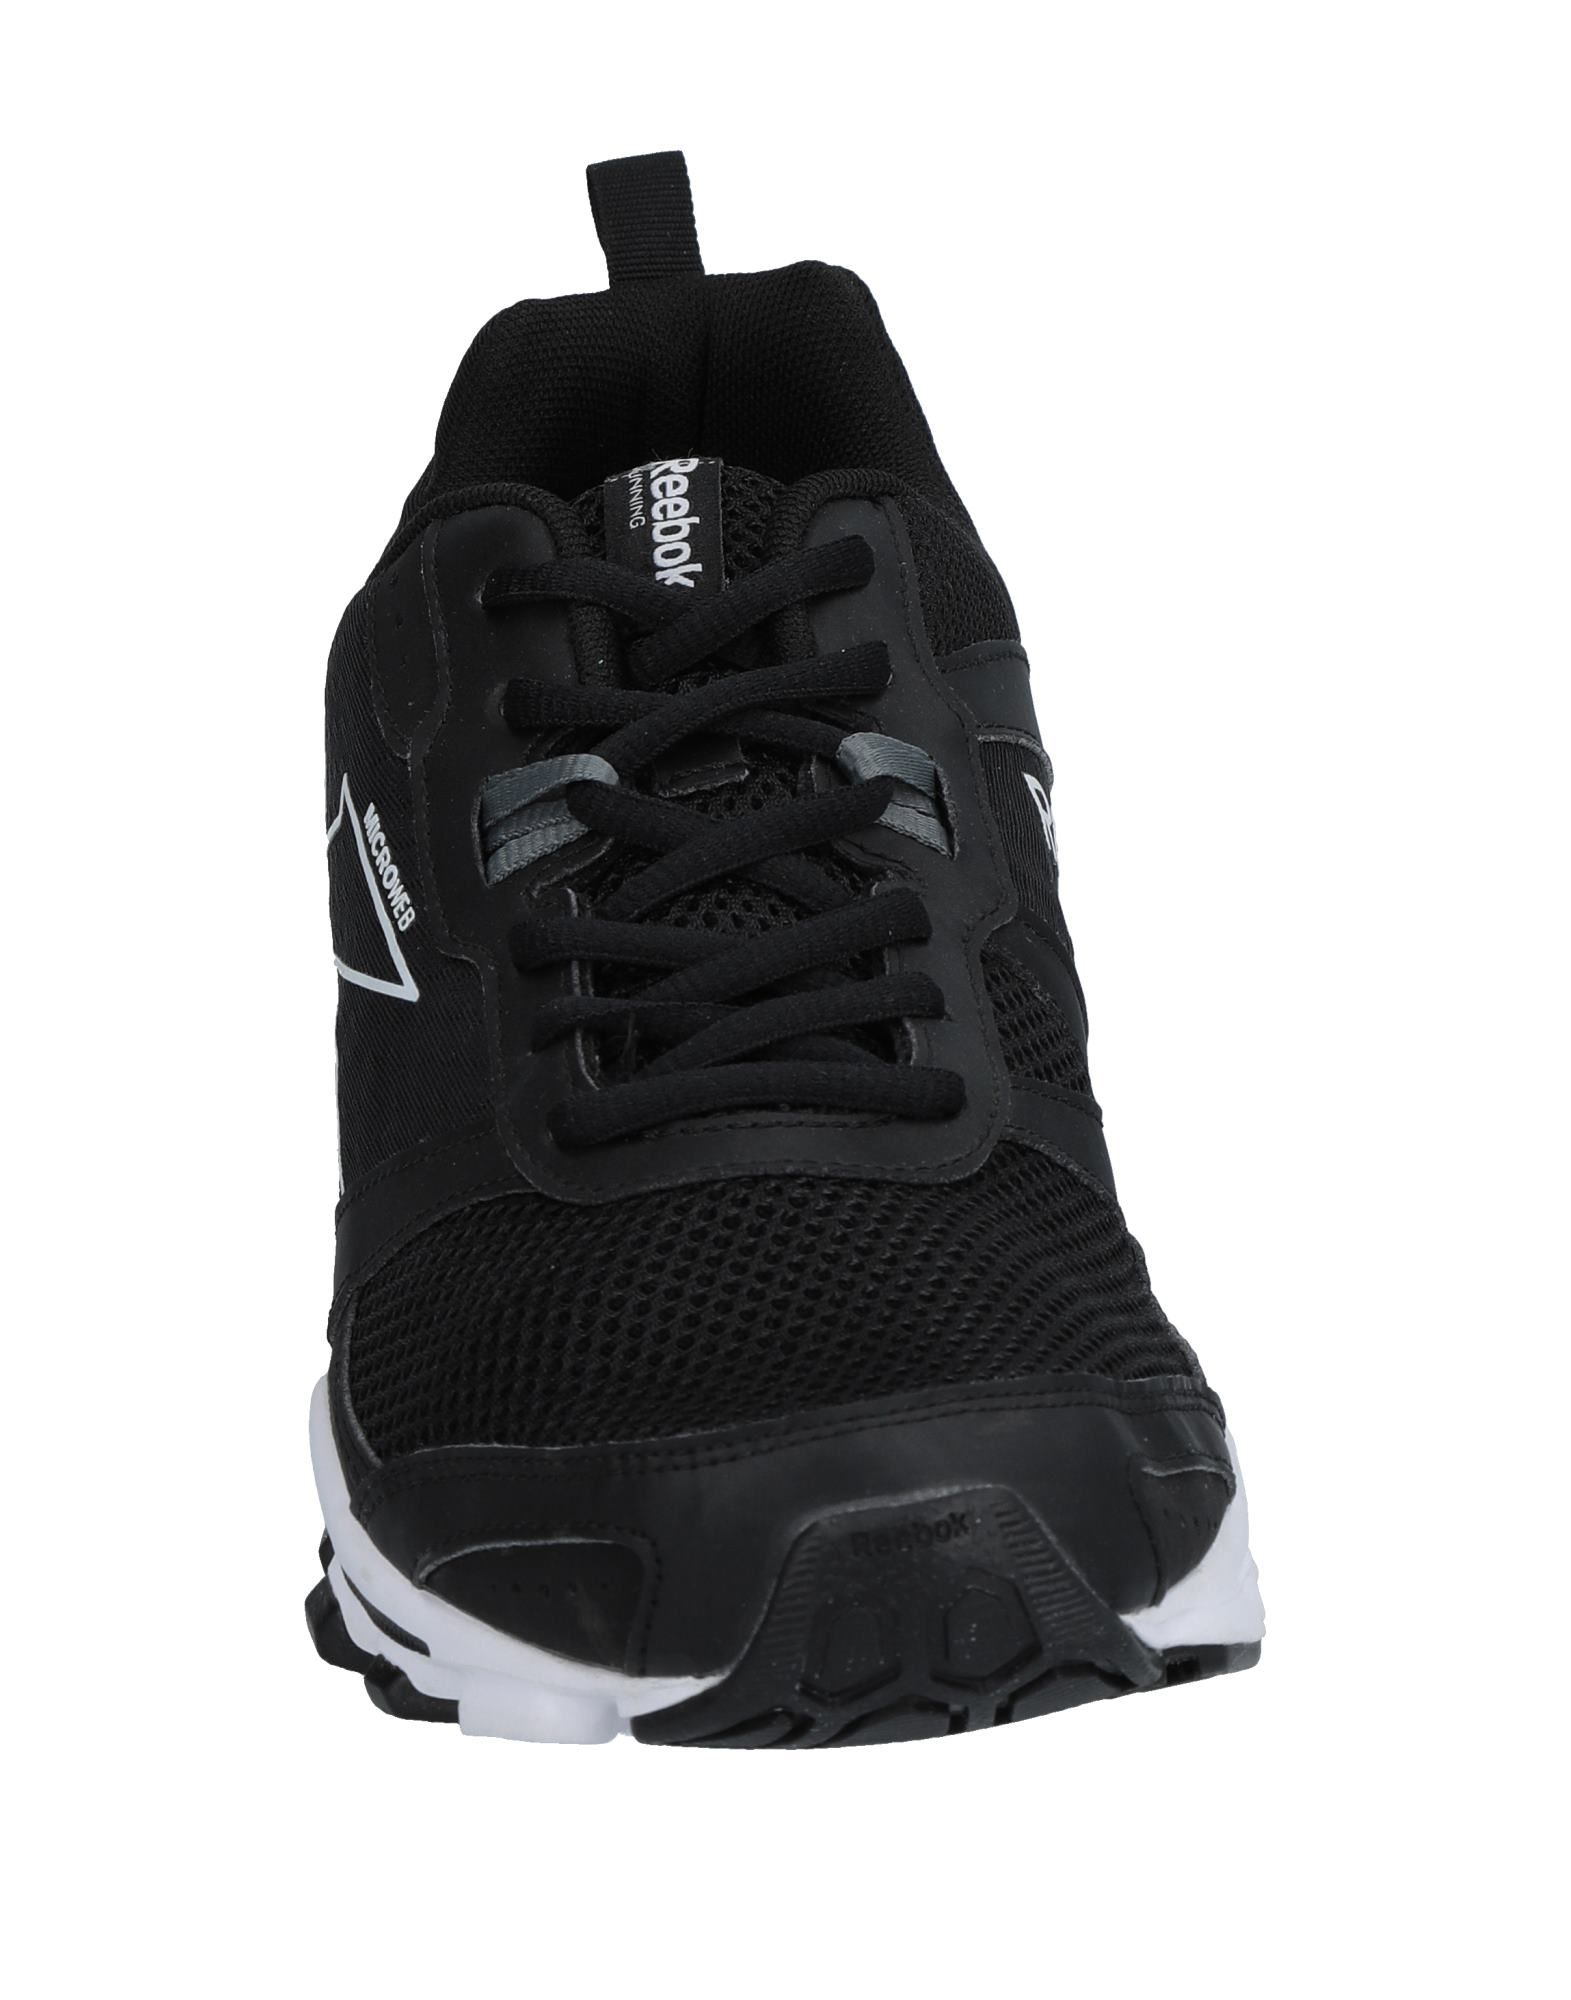 Reebok Sneakers Herren  11523892ED Schuhe Heiße Schuhe 11523892ED 4acb2b